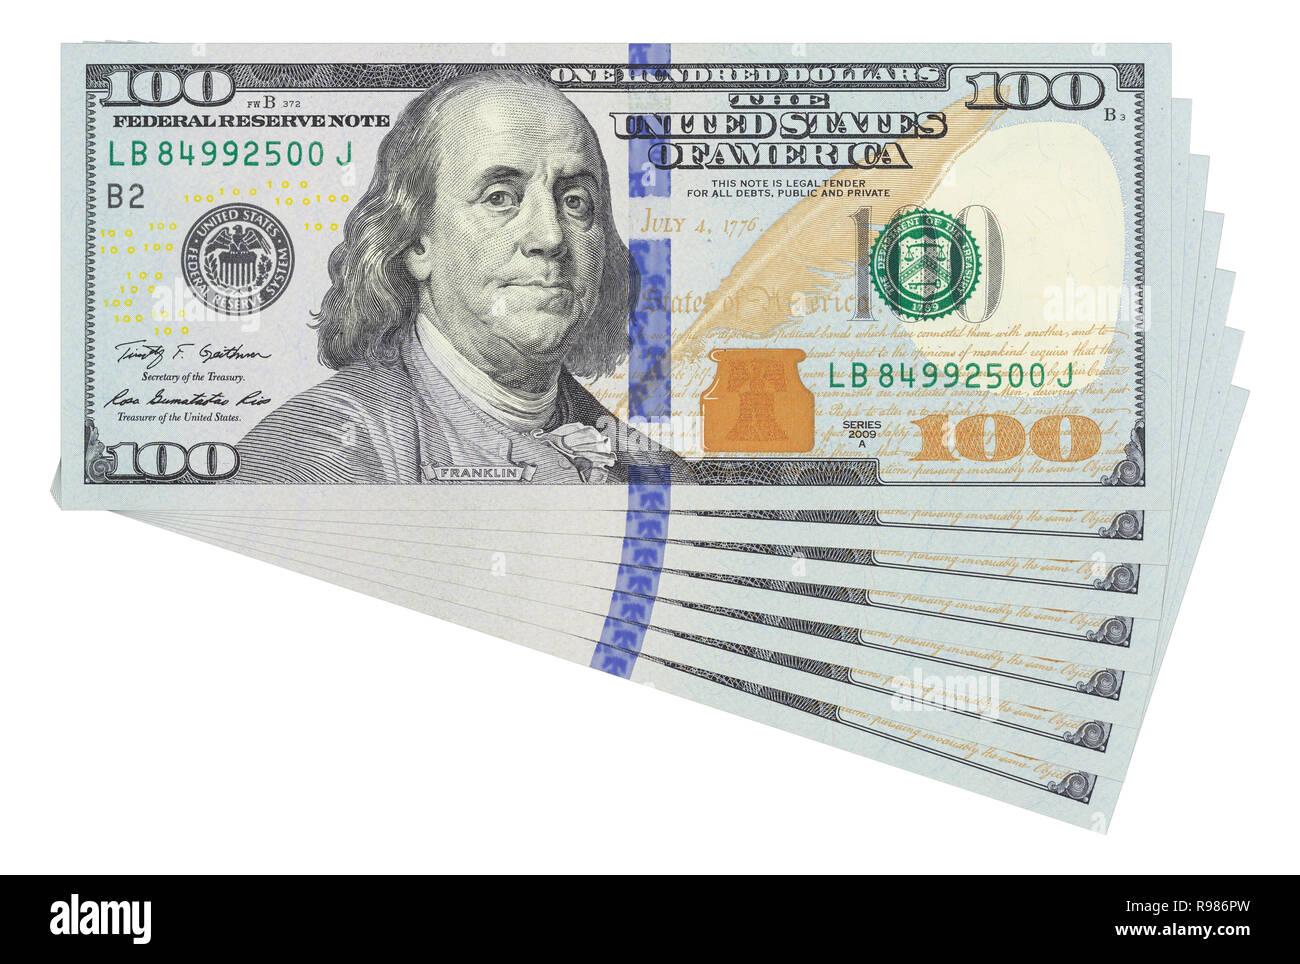 100 Dollar Bill Stock Photos & 100 Dollar Bill Stock Images